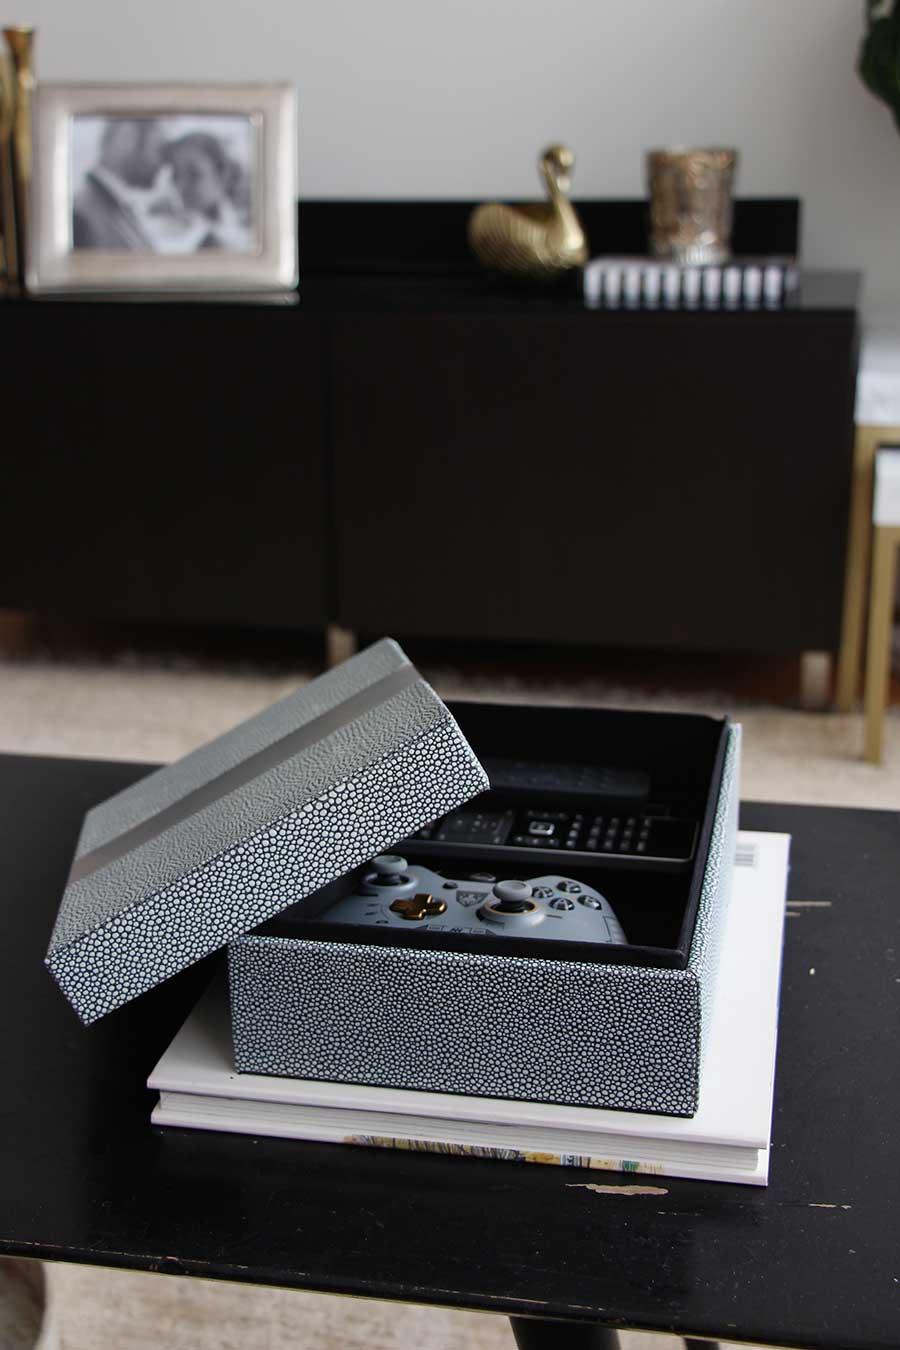 camuflage-tv-remote-controls-home-decor.jpg